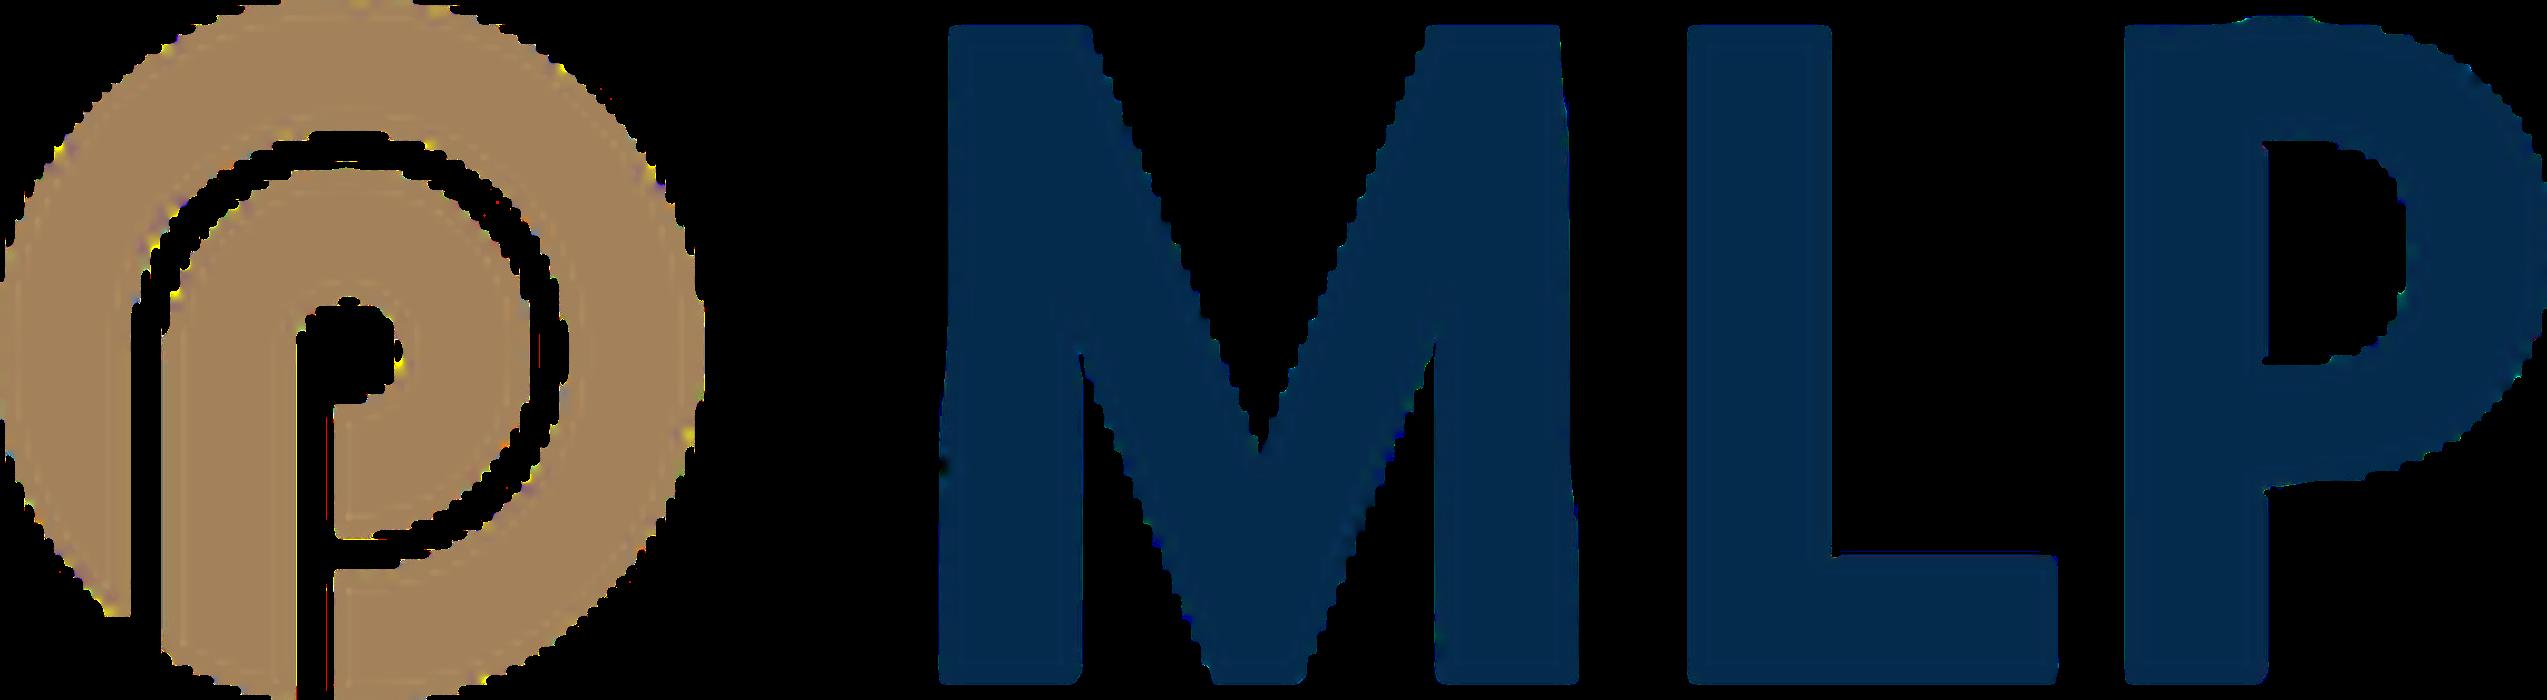 MLP Geschäftsstelle Hannover I